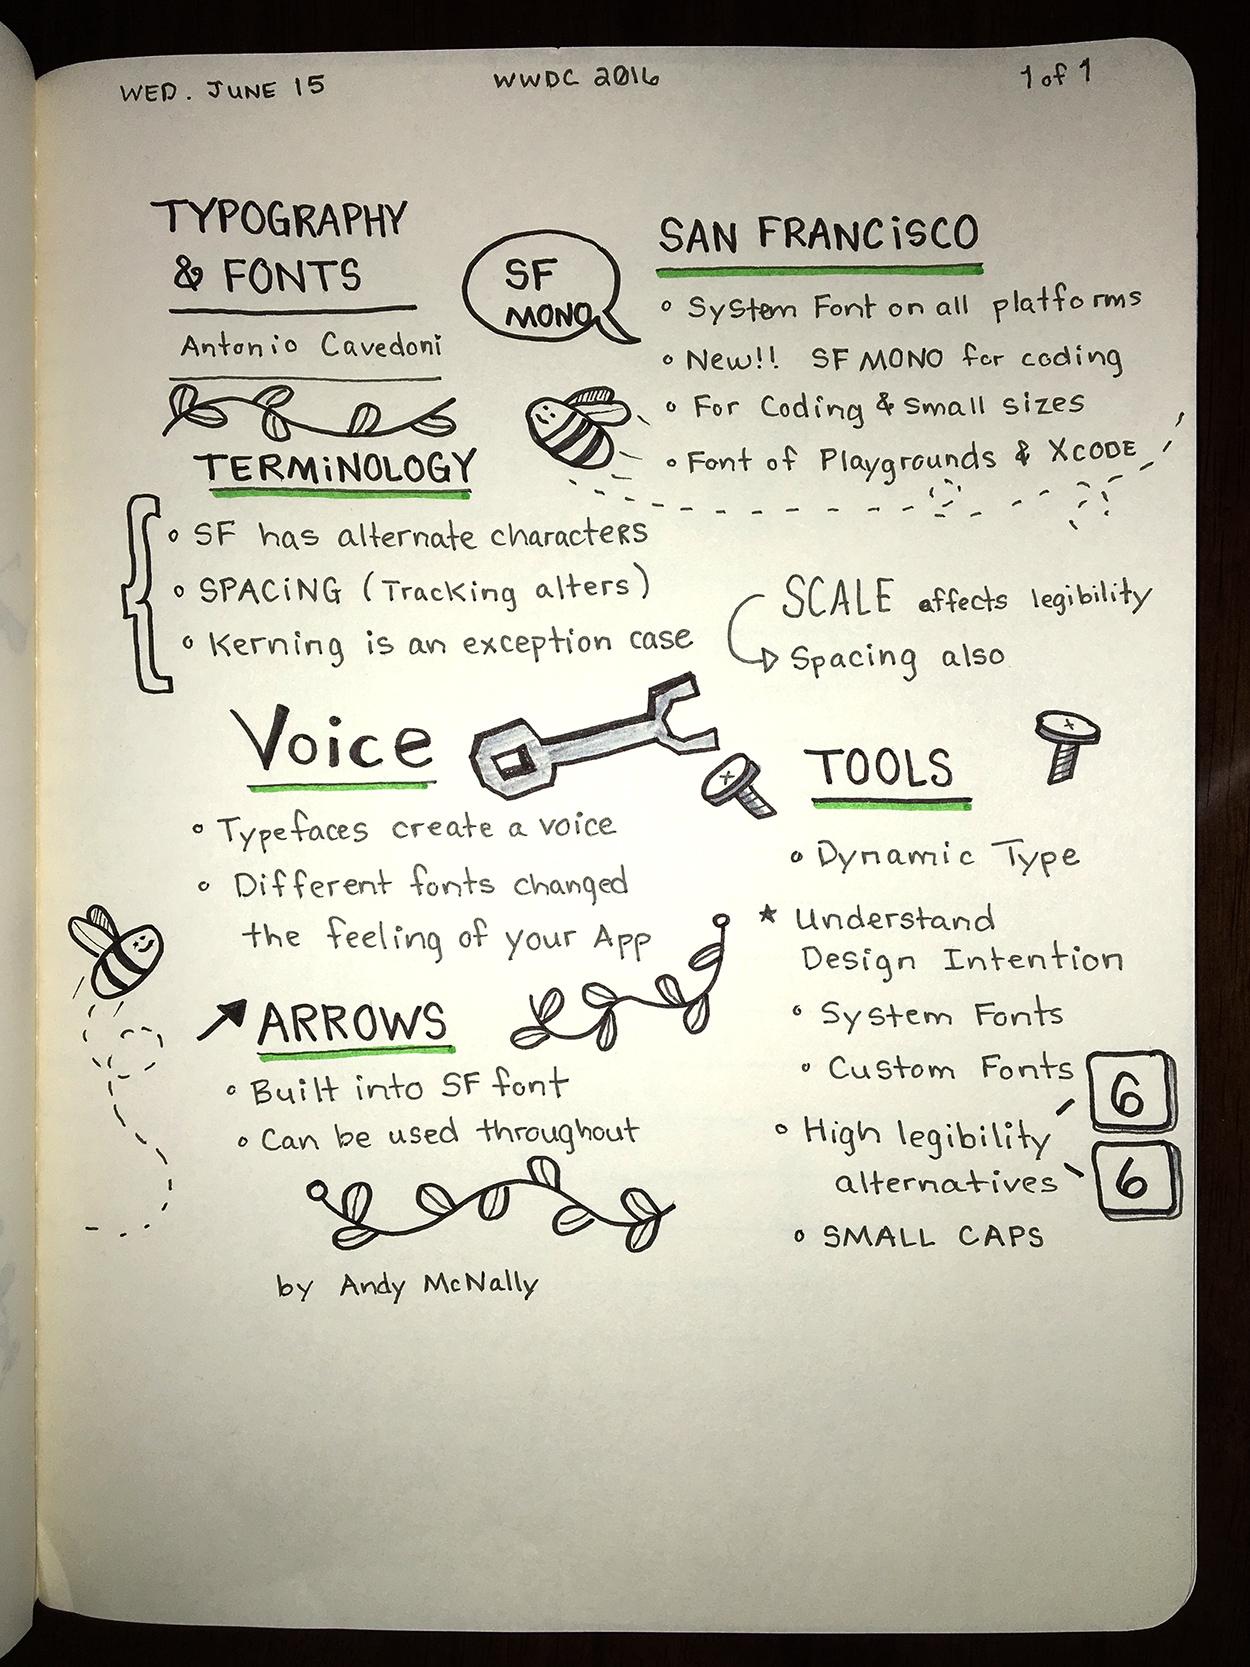 WWDC sketchnotes - Typography & Fonts